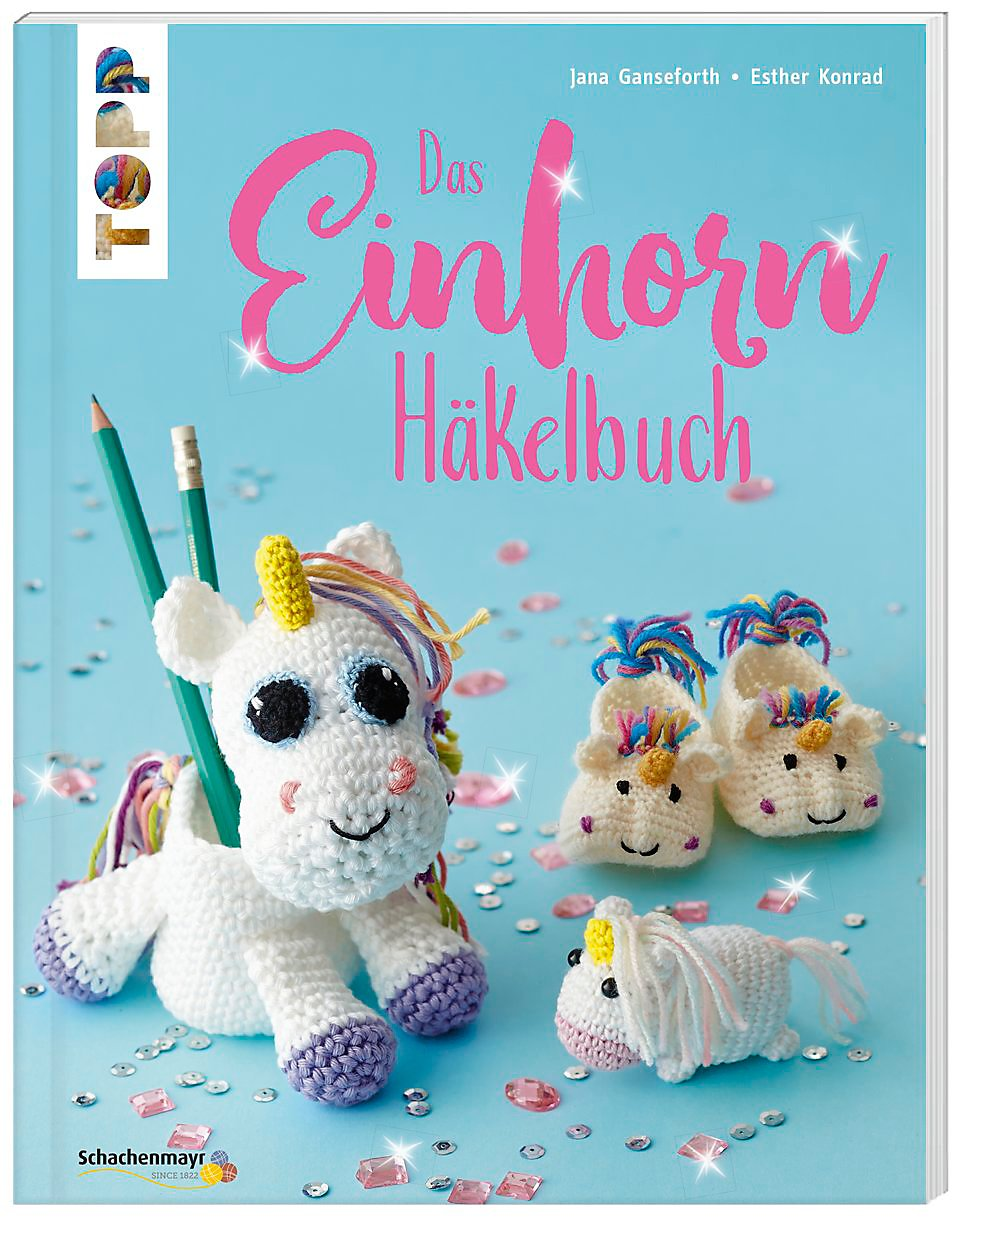 Das Einhorn Häkelbuch Buch Jetzt Bei Weltbildde Online Bestellen